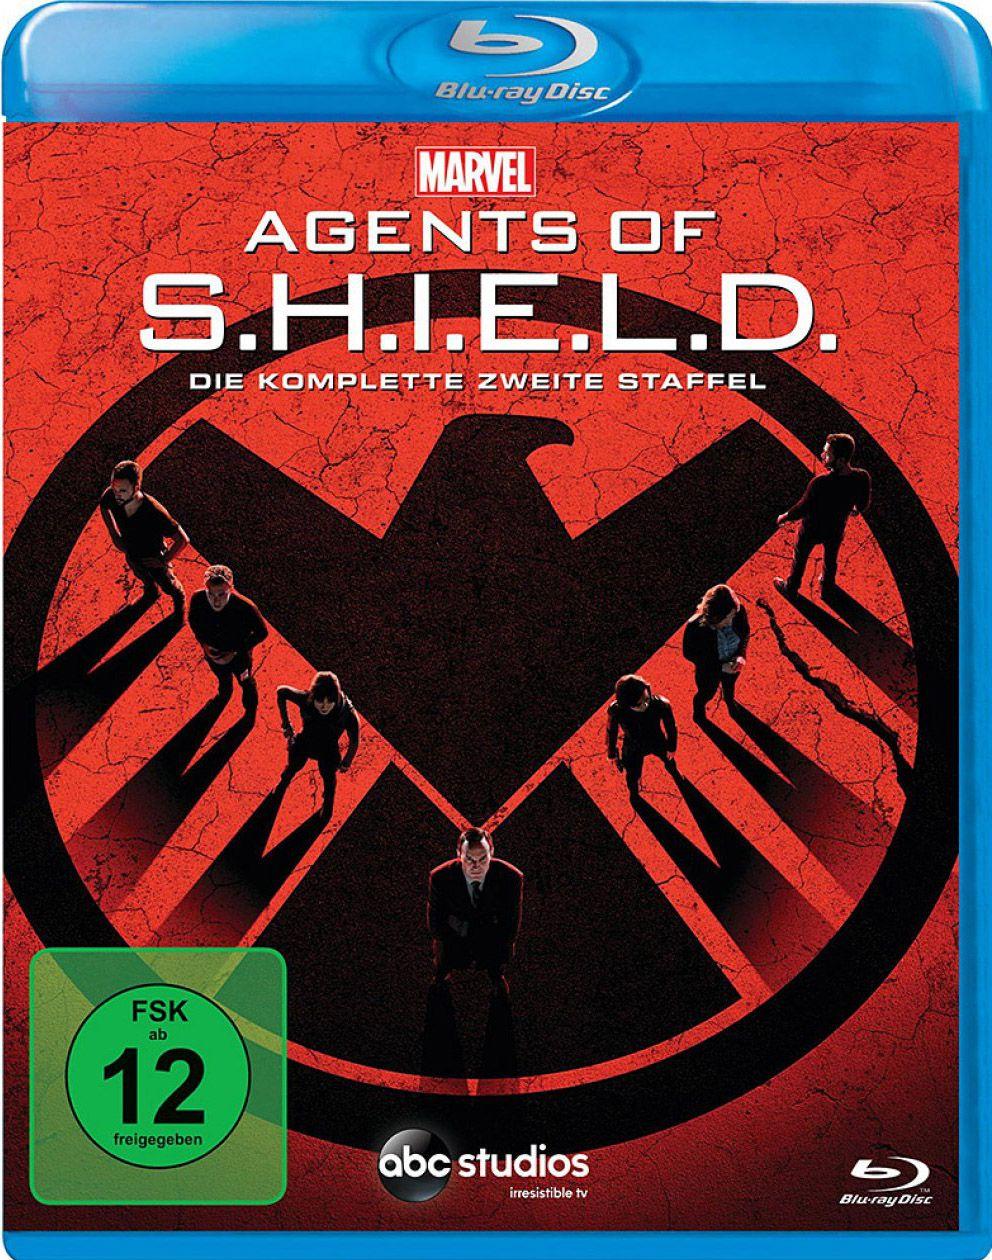 Marvel's Agents of S.H.I.E.L.D. - Die komplette zweite Staffel (6 Discs) (BLURAY)